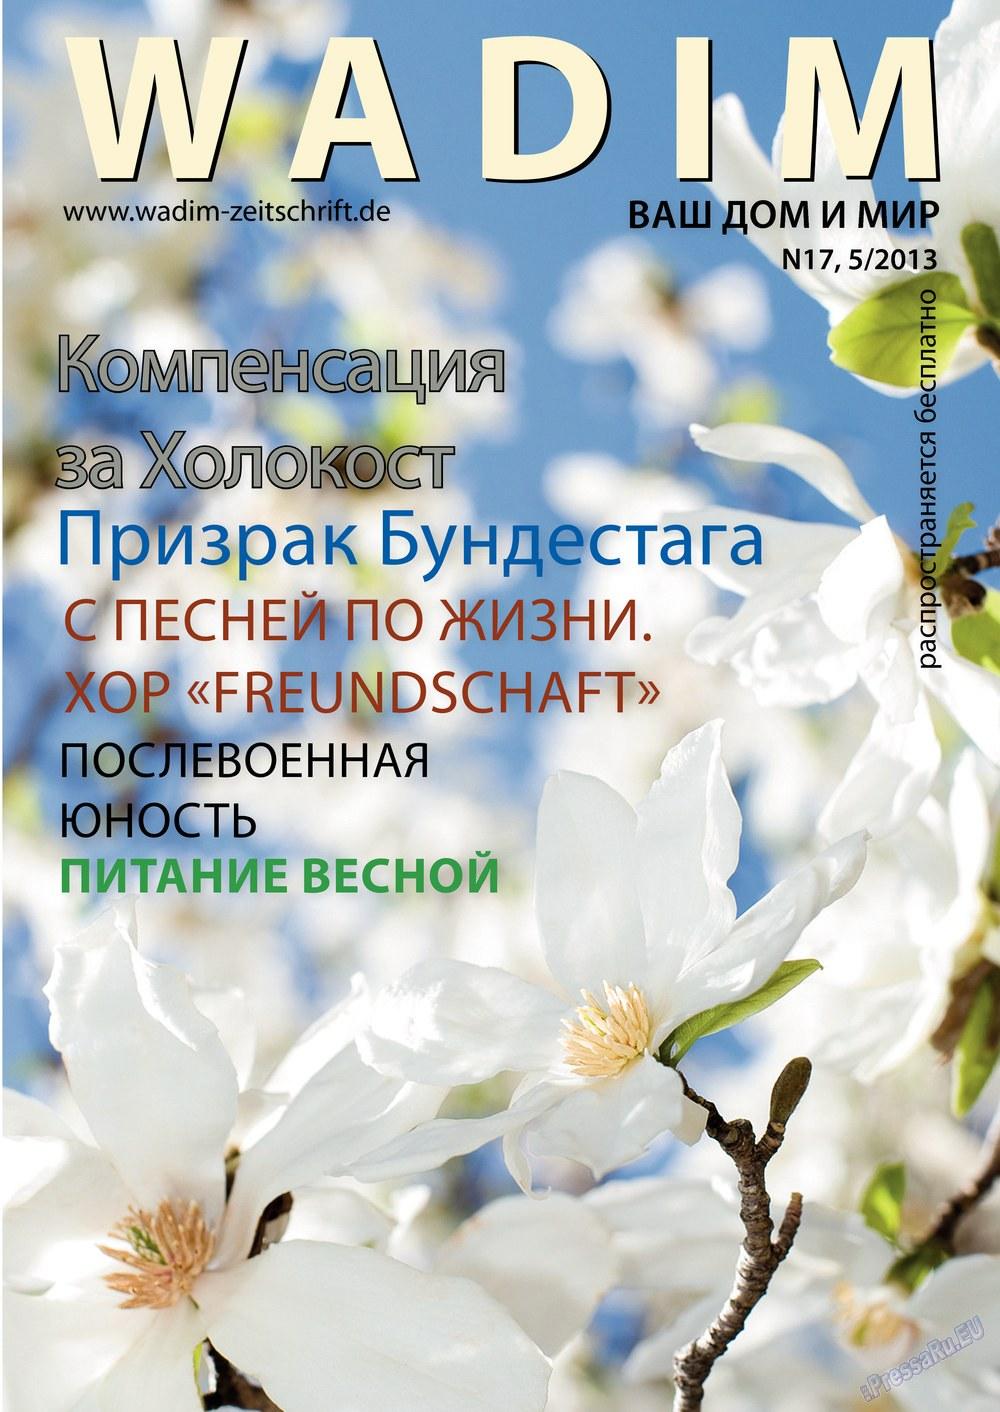 Wadim (журнал). 2013 год, номер 5, стр. 1